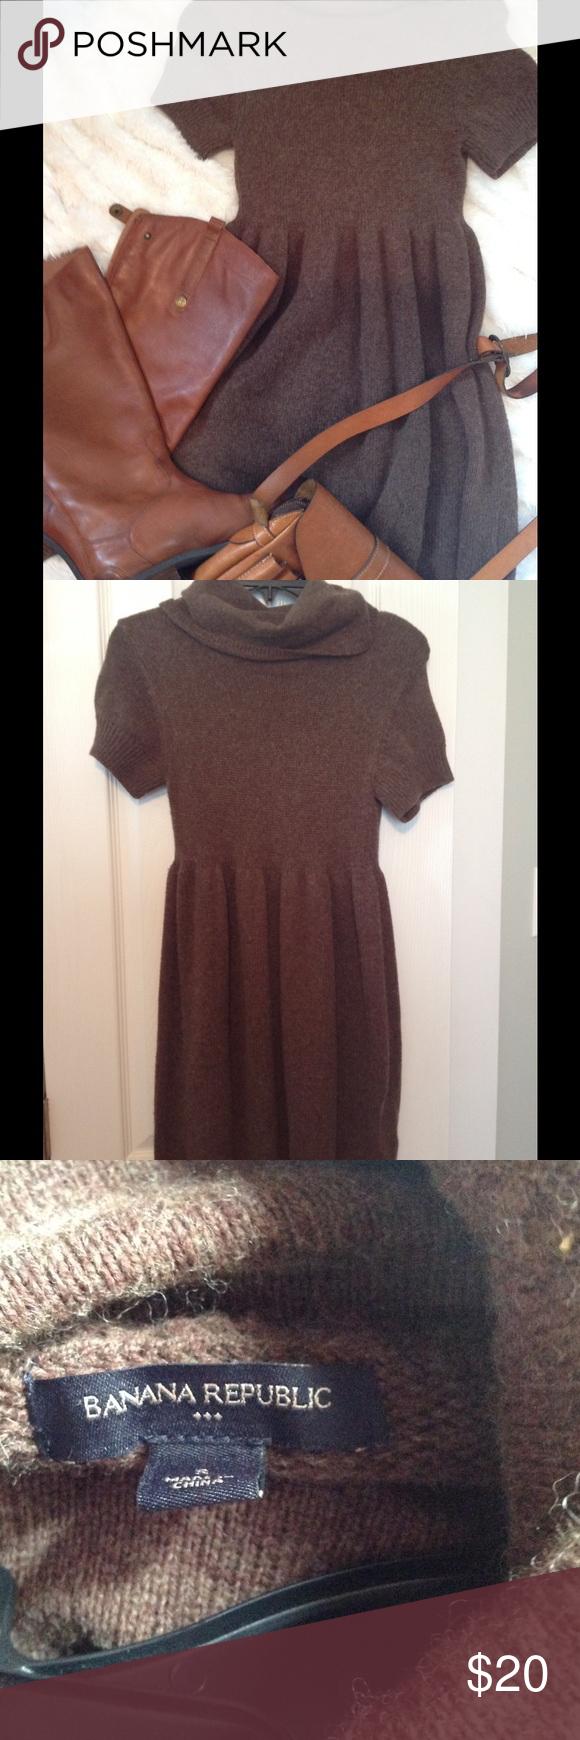 Banana Republic Sweater Dress Very cute brown knit sweater dress ...